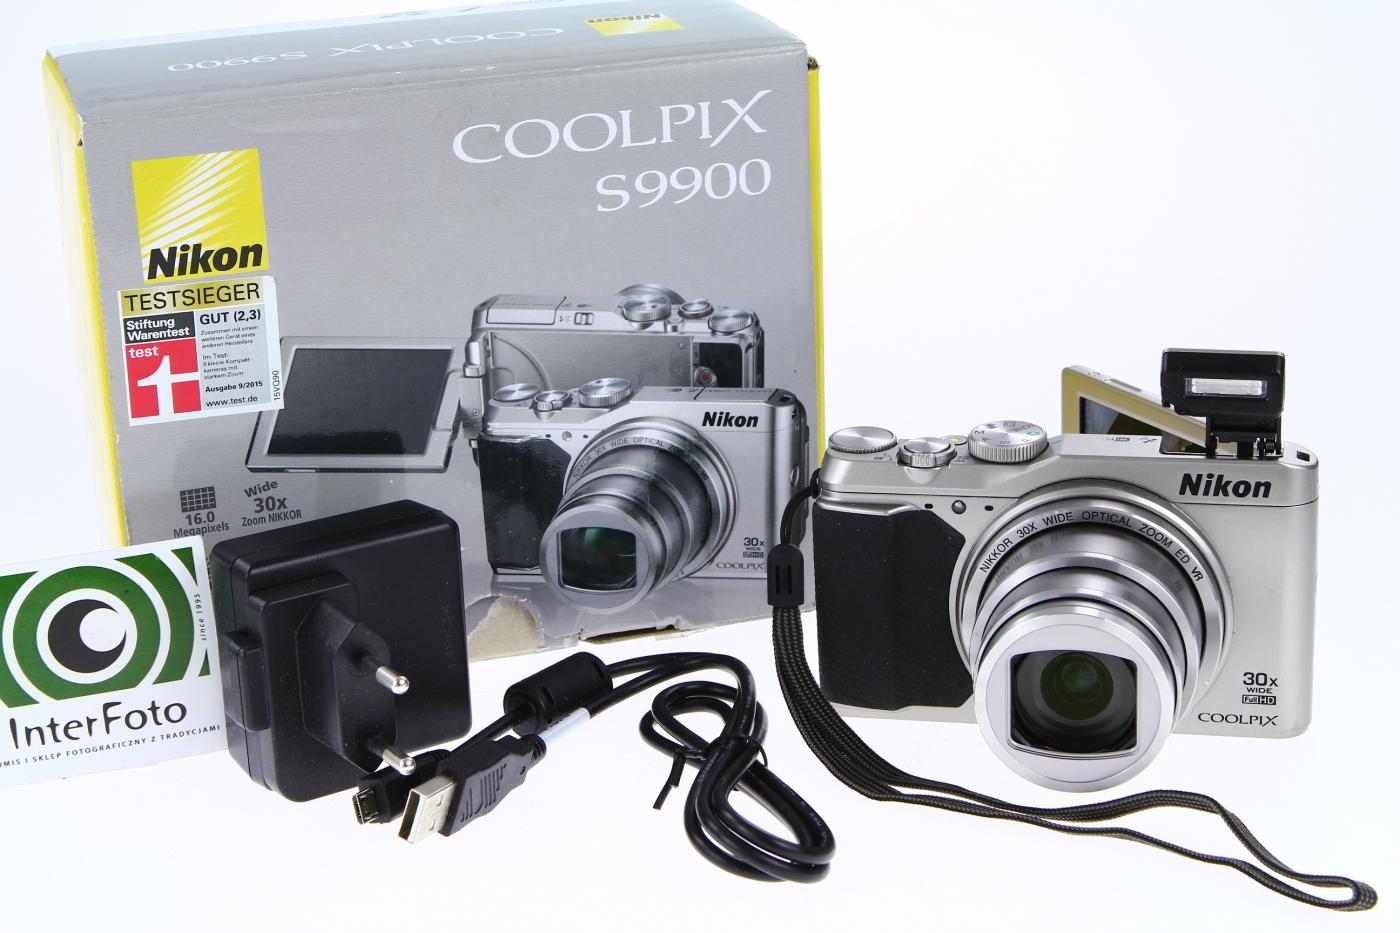 InterFoto: Nikon Coolpix S9900 Wi-Fi GPS 30x Zoom